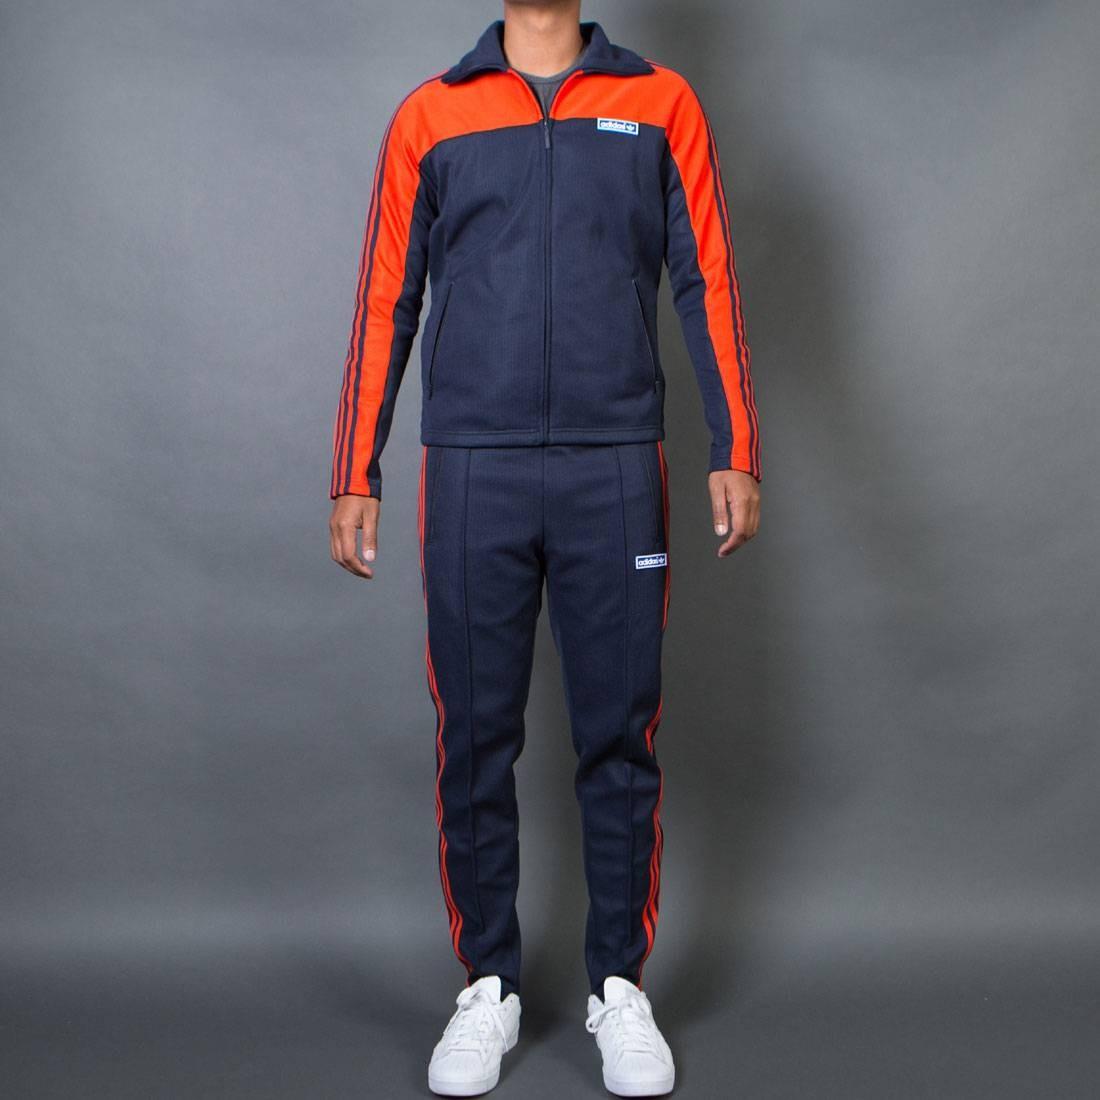 7d1f0ca11c30 Adidas Joggers Suit Mens thehampsteadfactory.co.uk